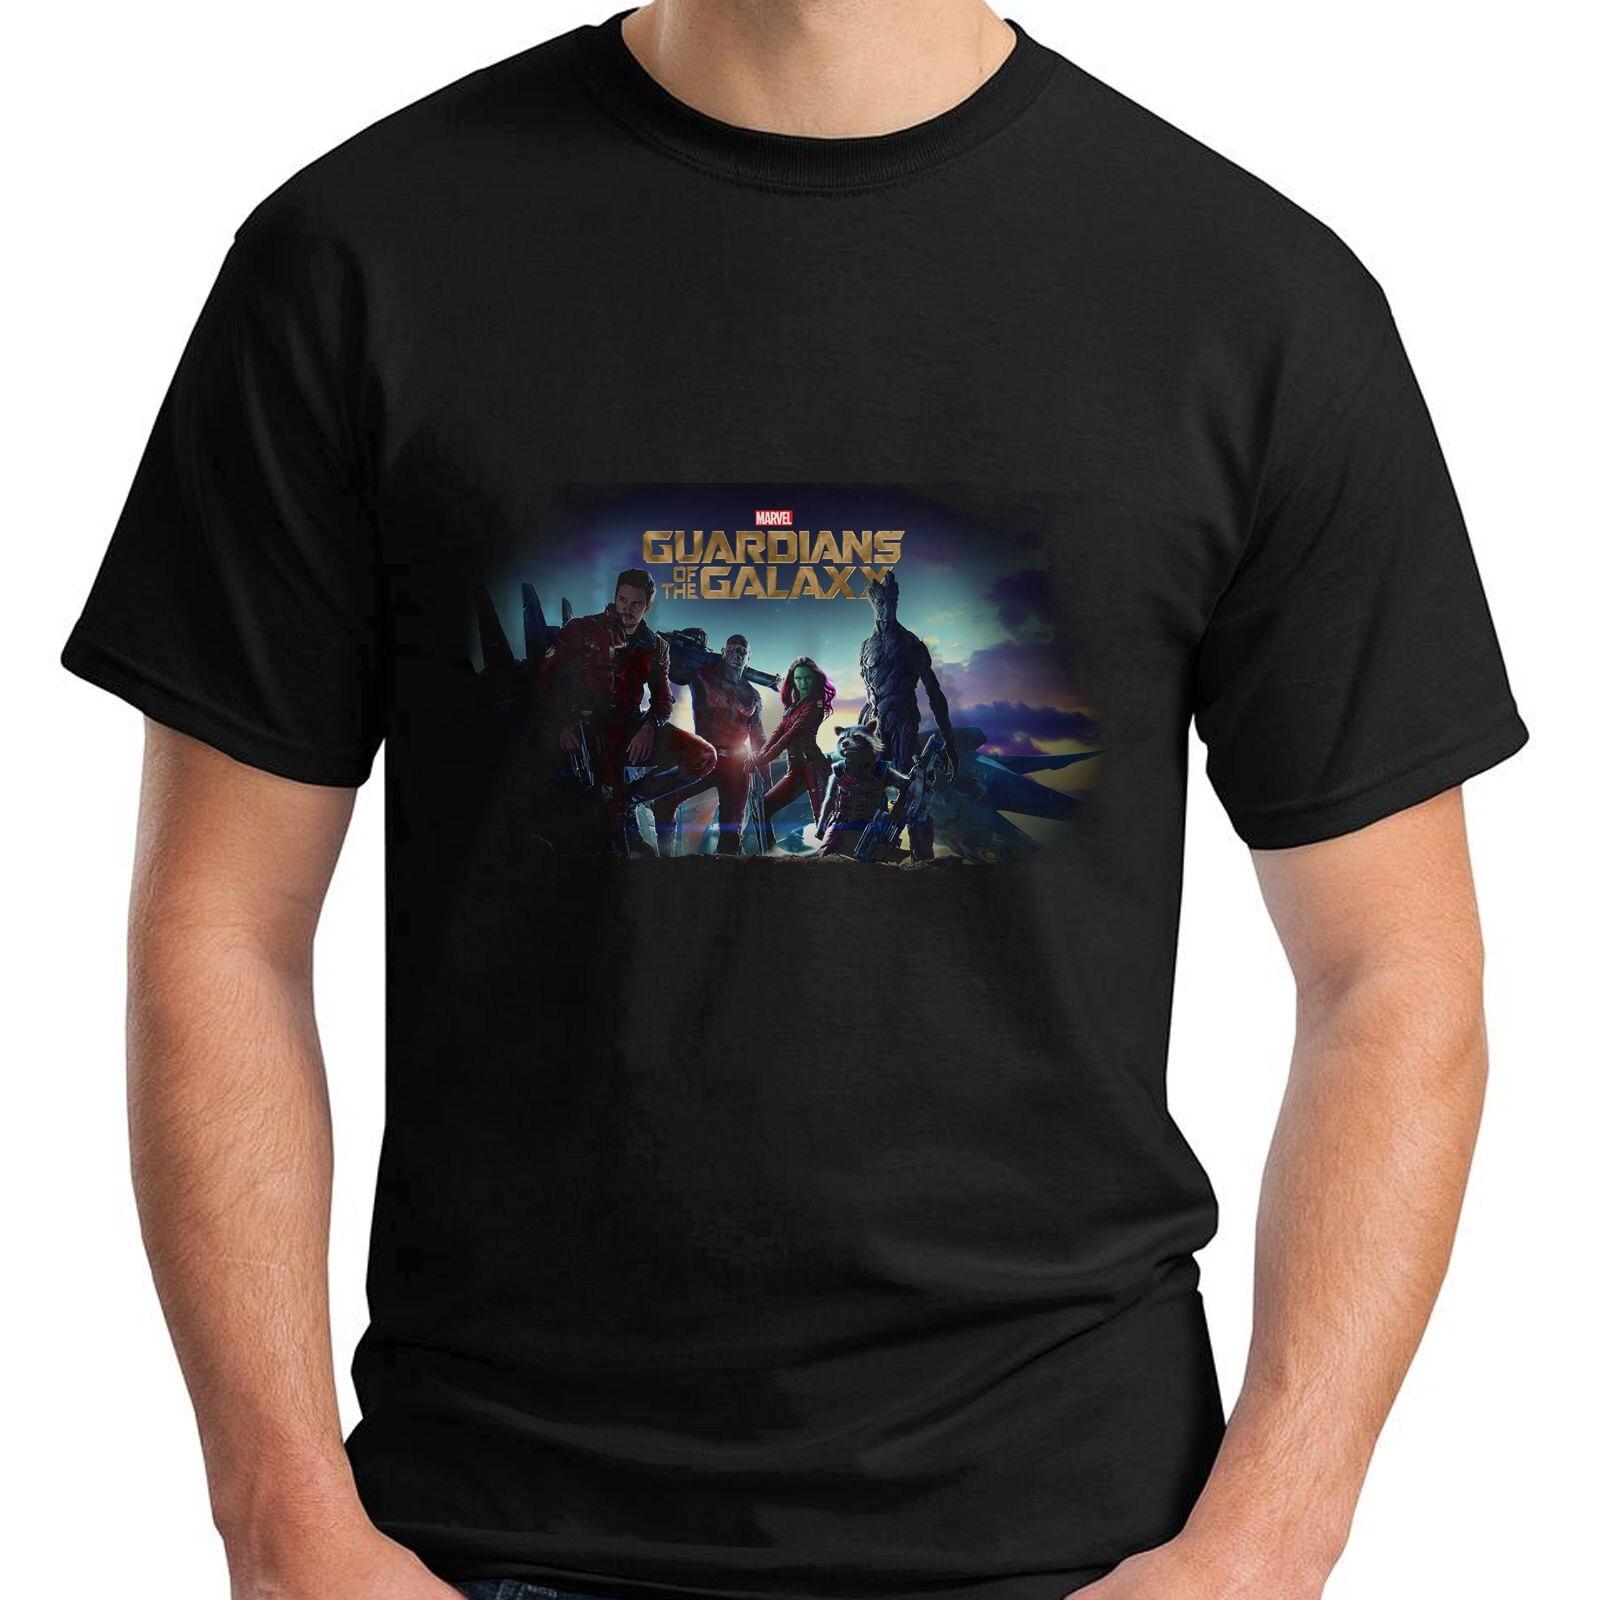 New Guardians Of The Galaxy Short Sleeve Mens Black T-Shirt Size S-5XL Summer Short Sleeves Cotton Fashion t Shirt